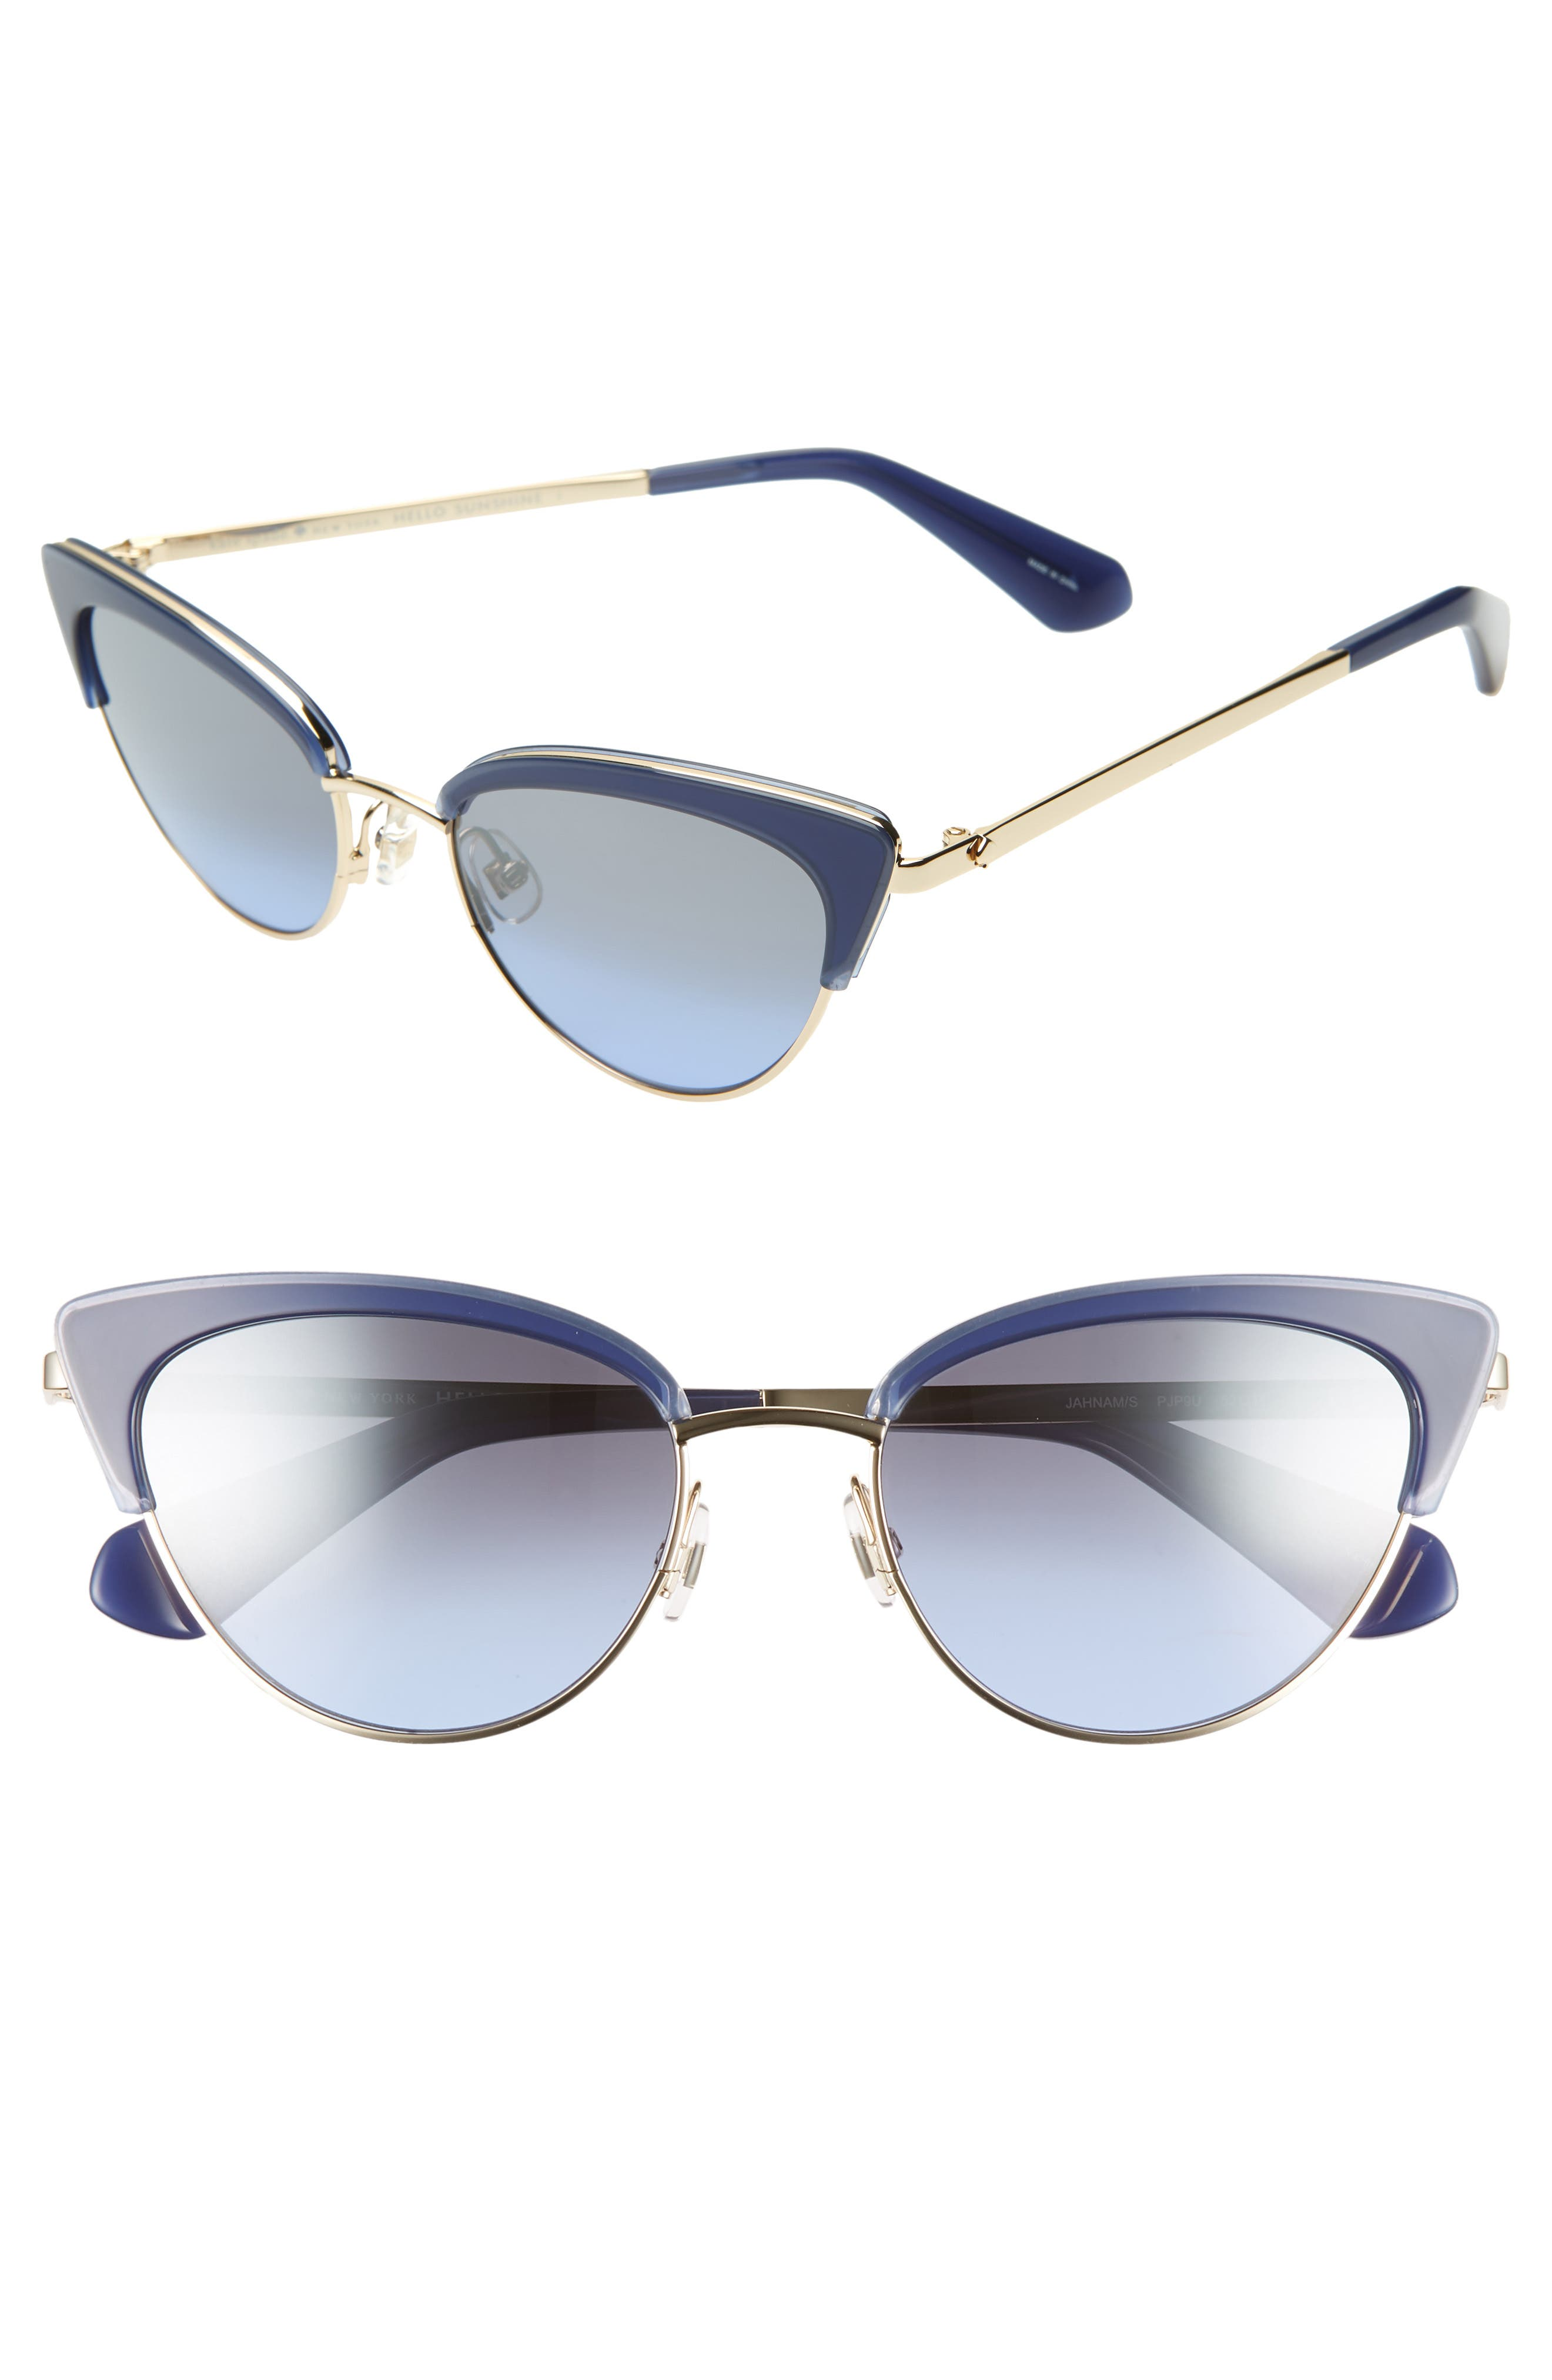 KATE SPADE NEW YORK,                             jahnams 52mm cat eye sunglasses,                             Main thumbnail 1, color,                             BLUE